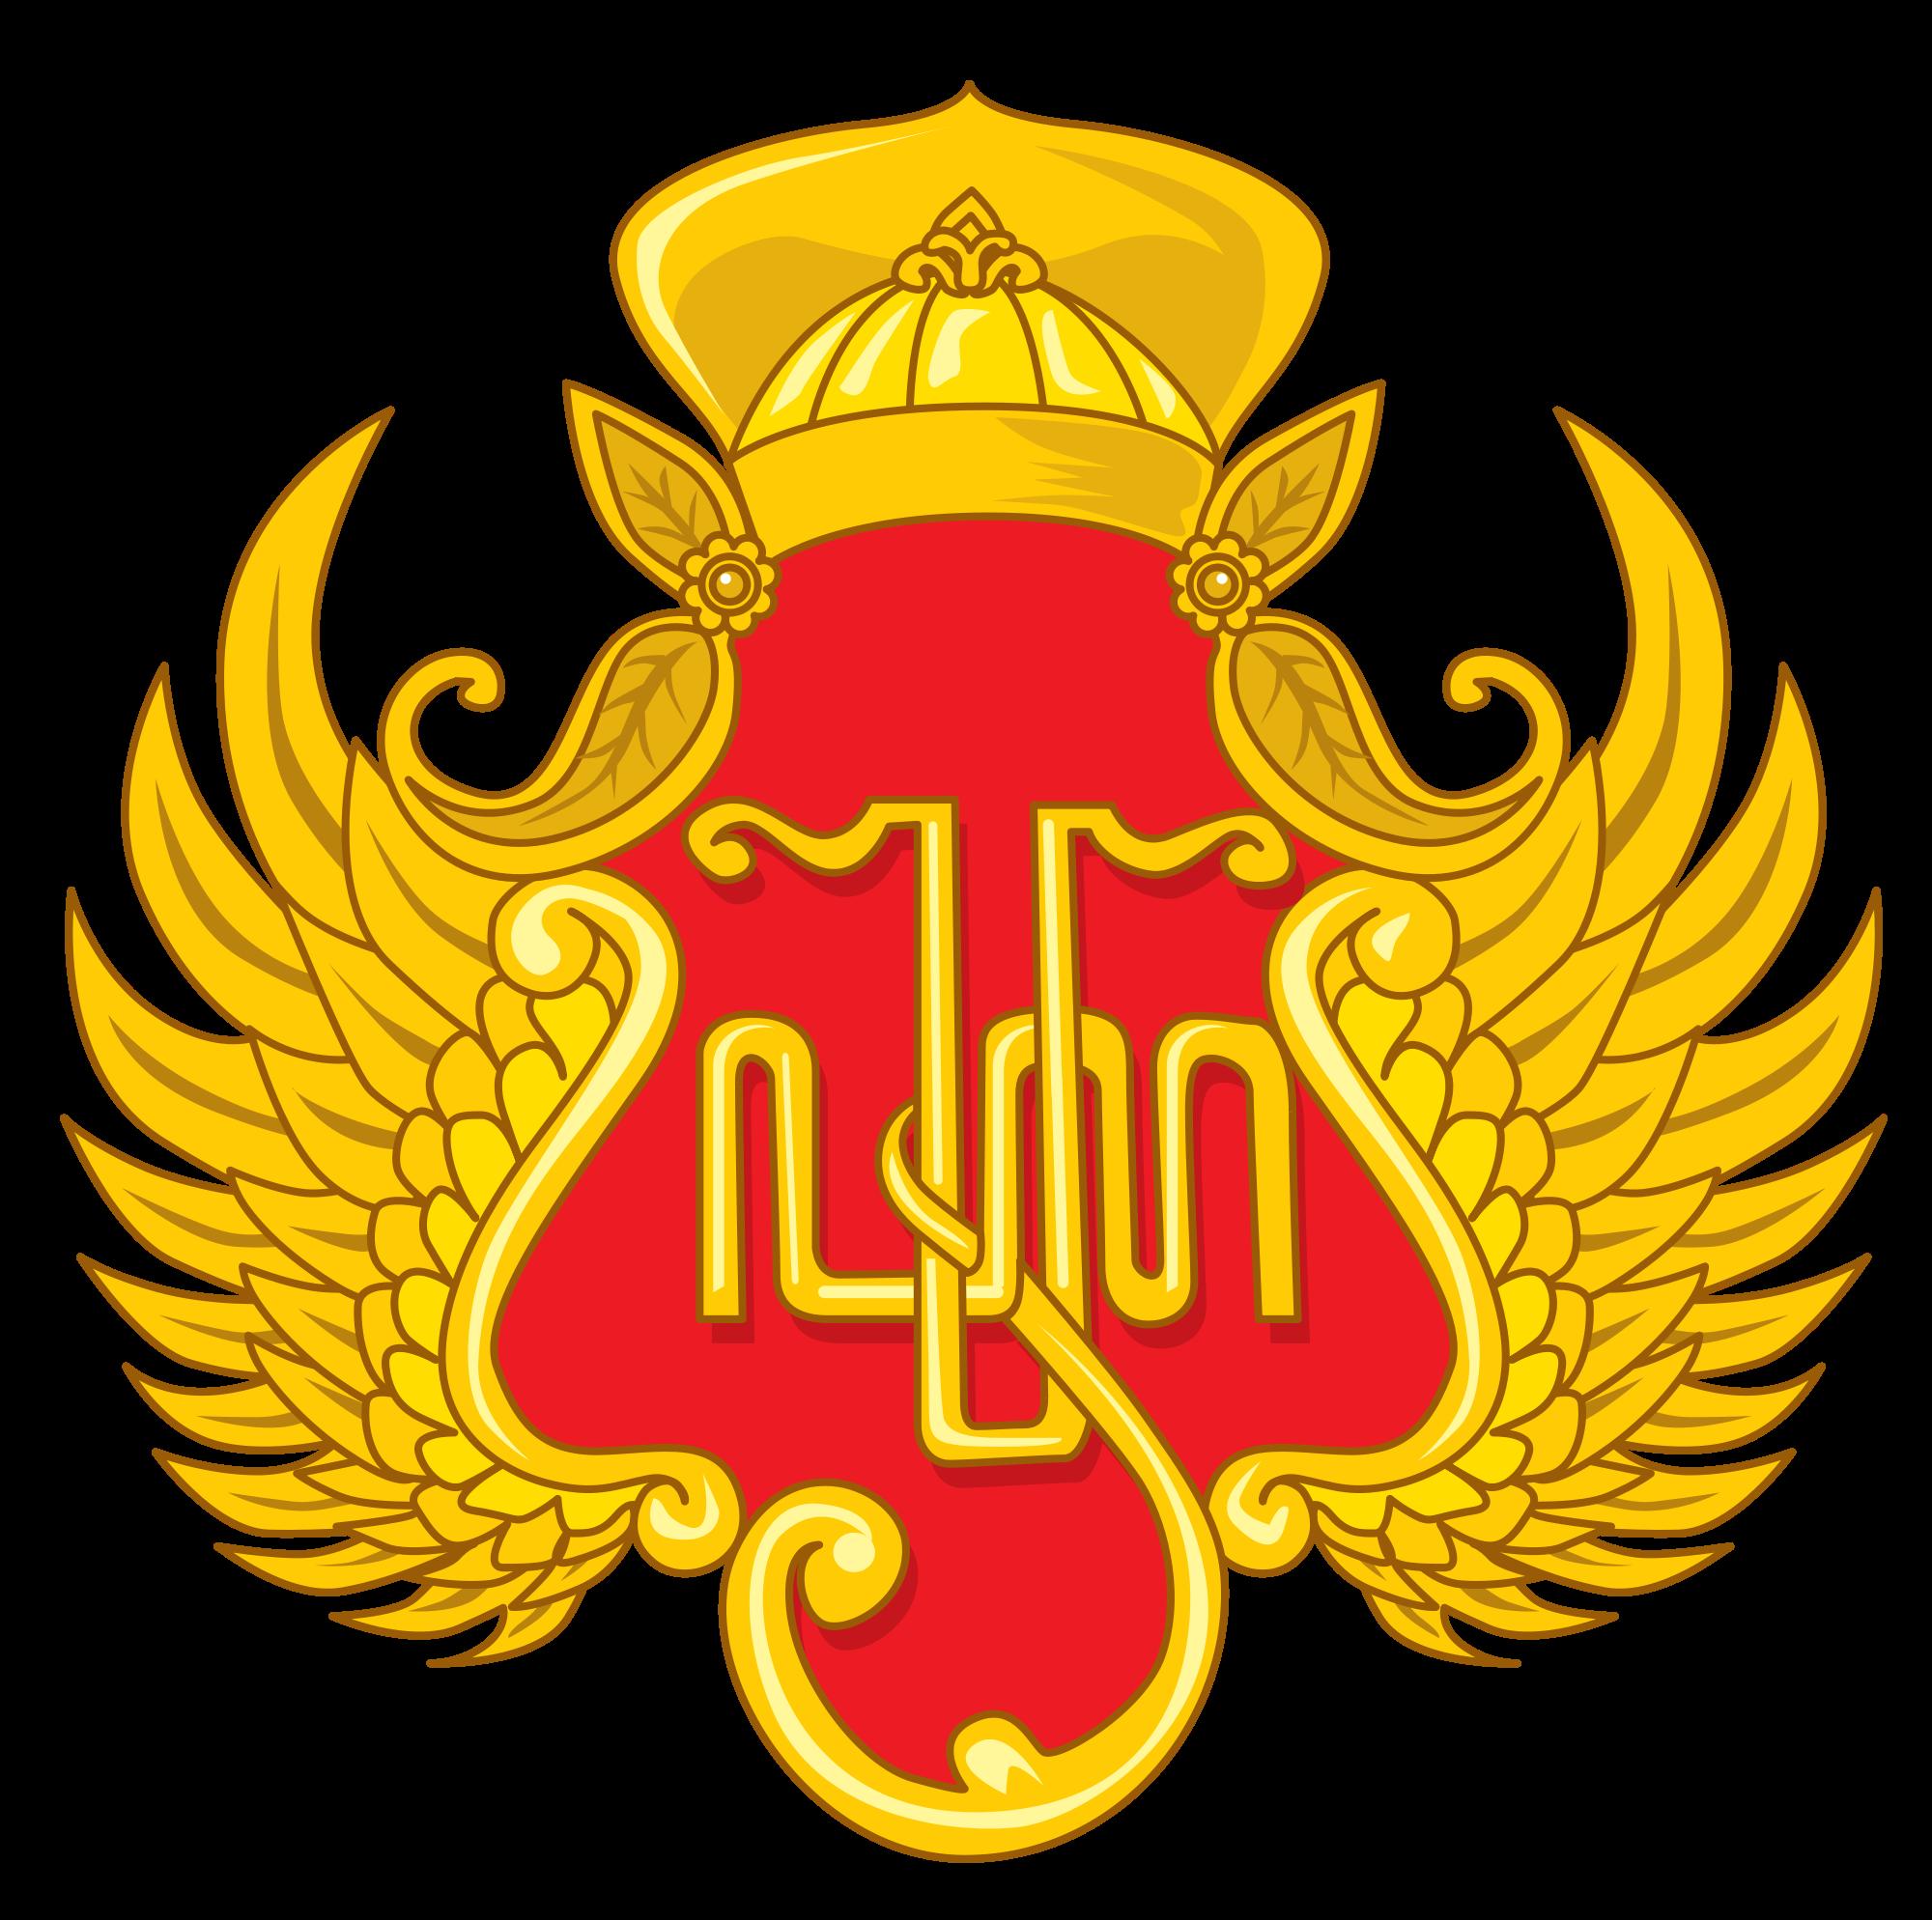 The Emblem Of Karaton Ngayogyakarta Hadiningrat Yogyakarta Sultanate The Emblem Belongs To Sultan Hamengkubhuwon Lambang Negara Sejarah Seni Foto Zaman Dulu